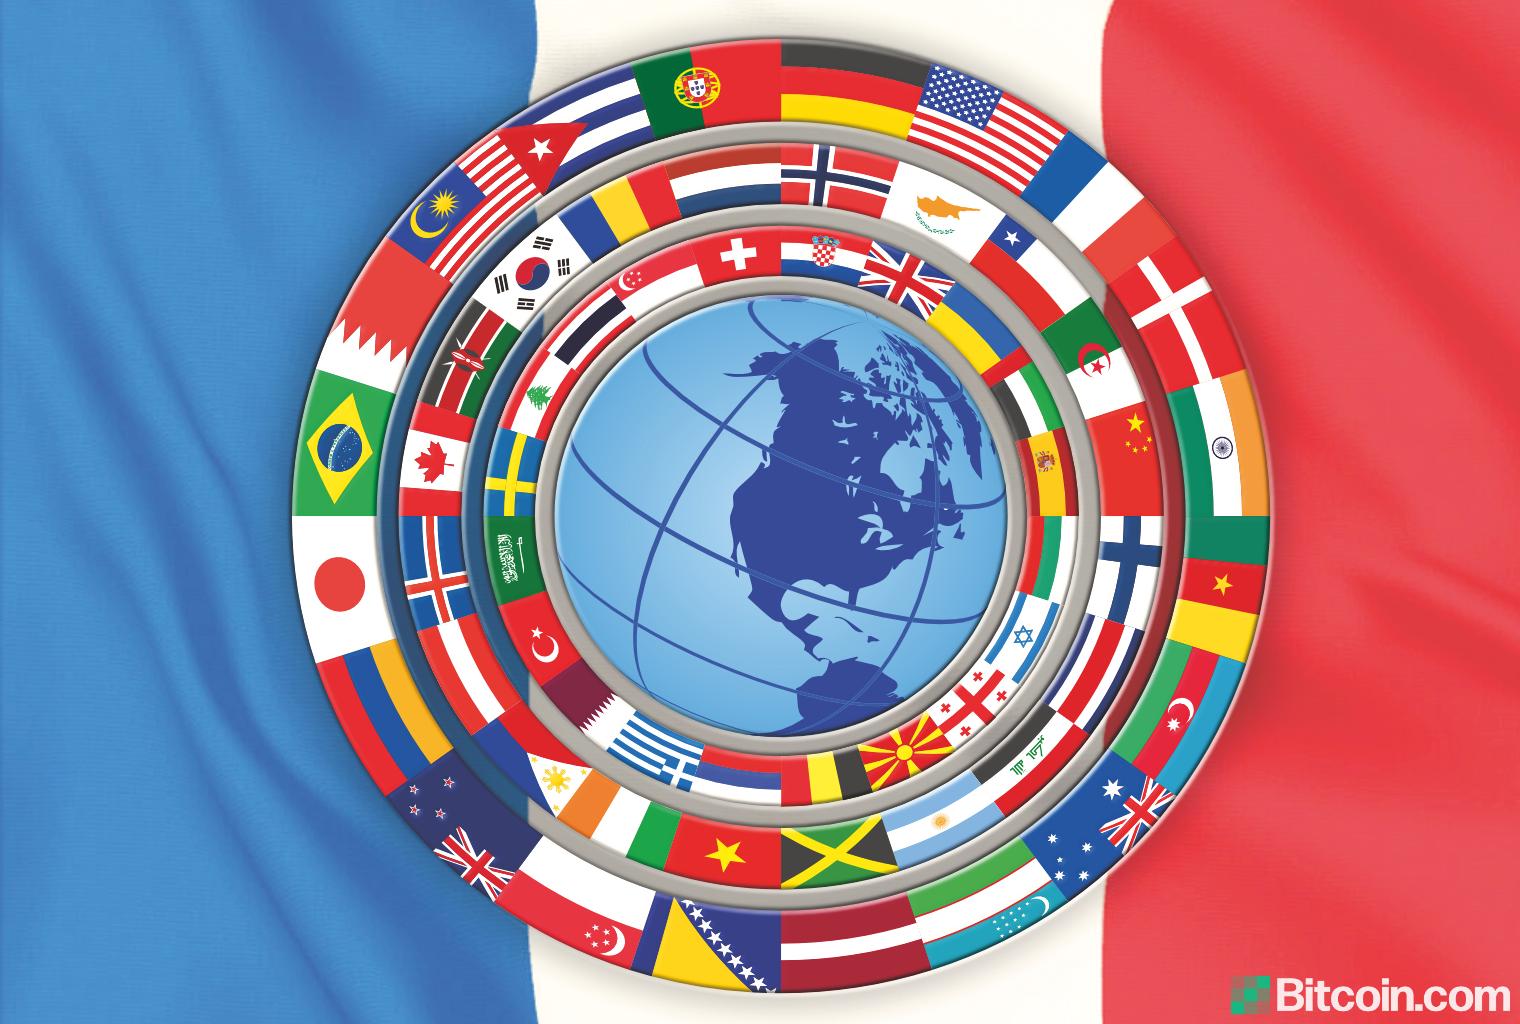 French Court Considers Bitcoin Money, Cryptocurrencies Legitimized in South Korea, Australia, India